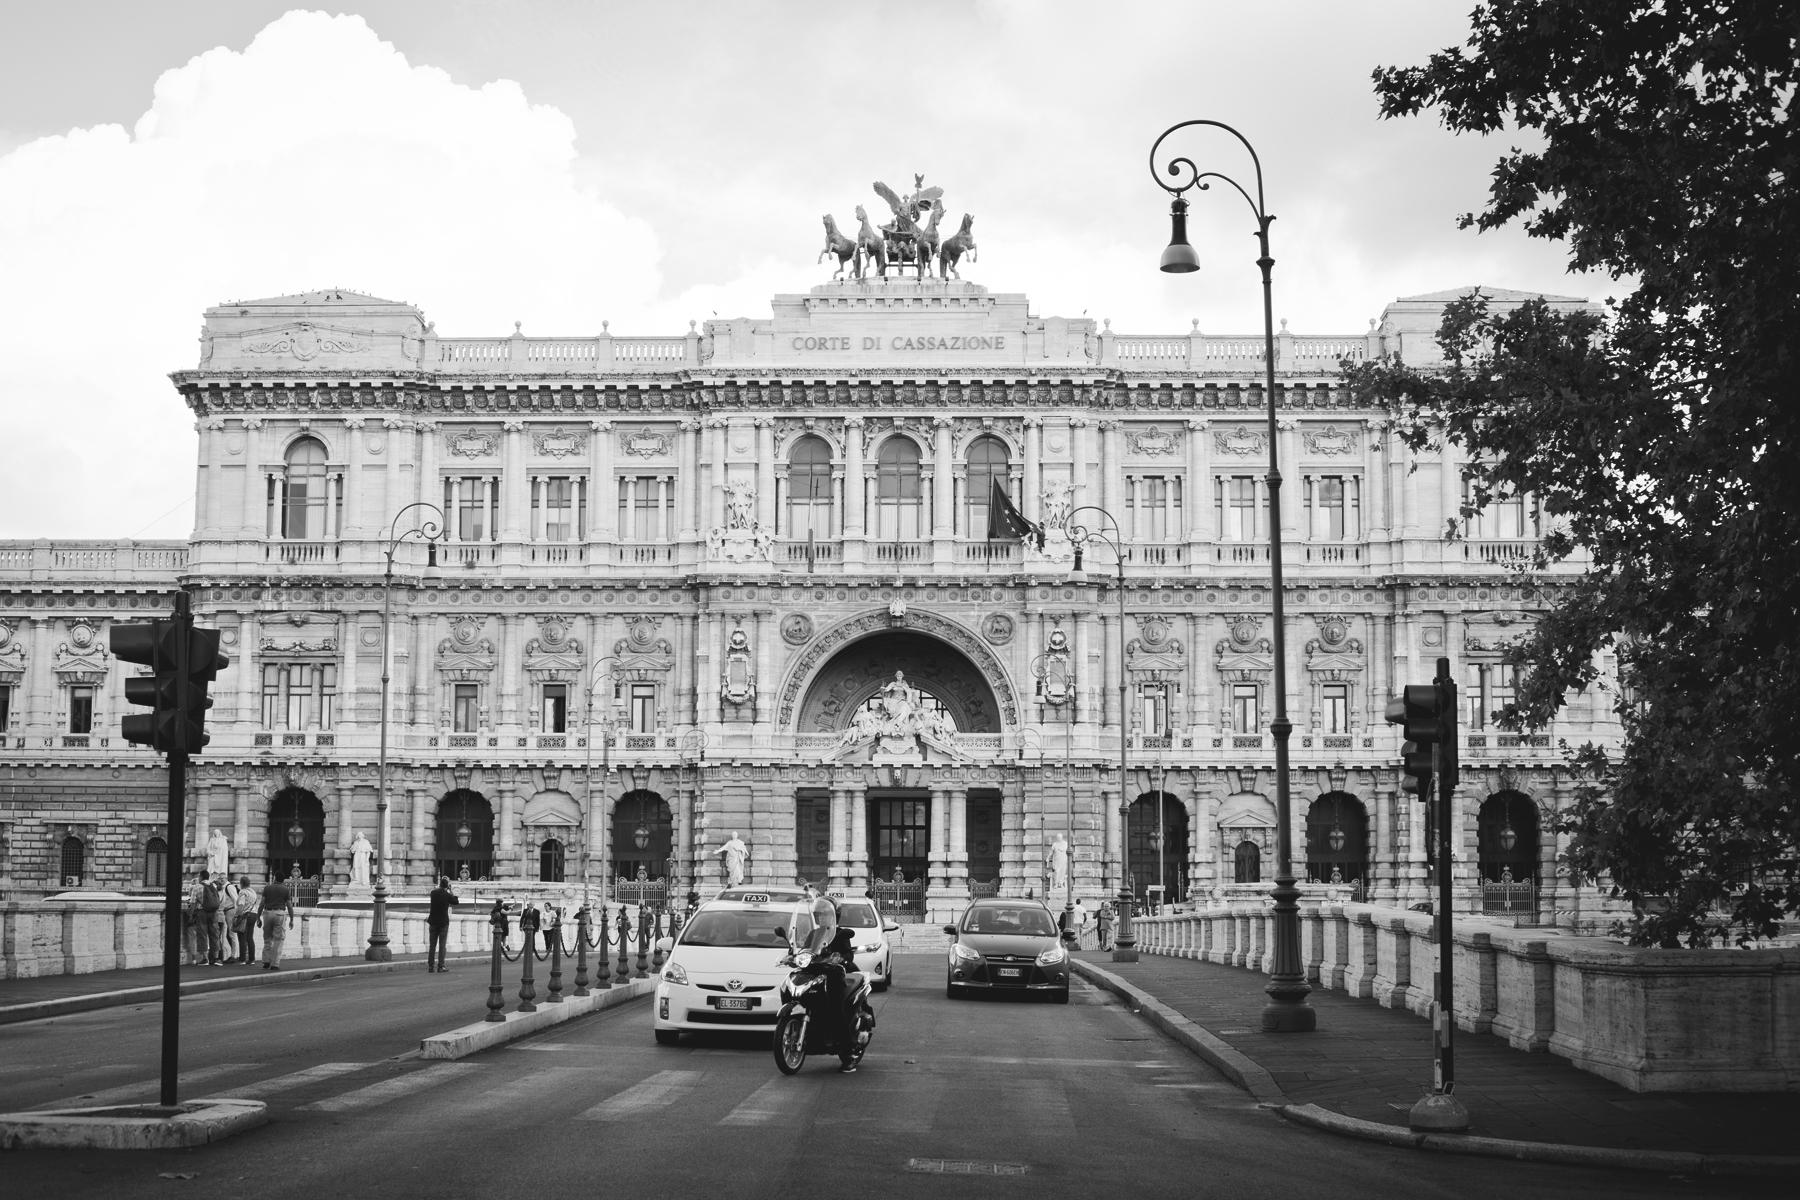 Rome's Supreme Court building